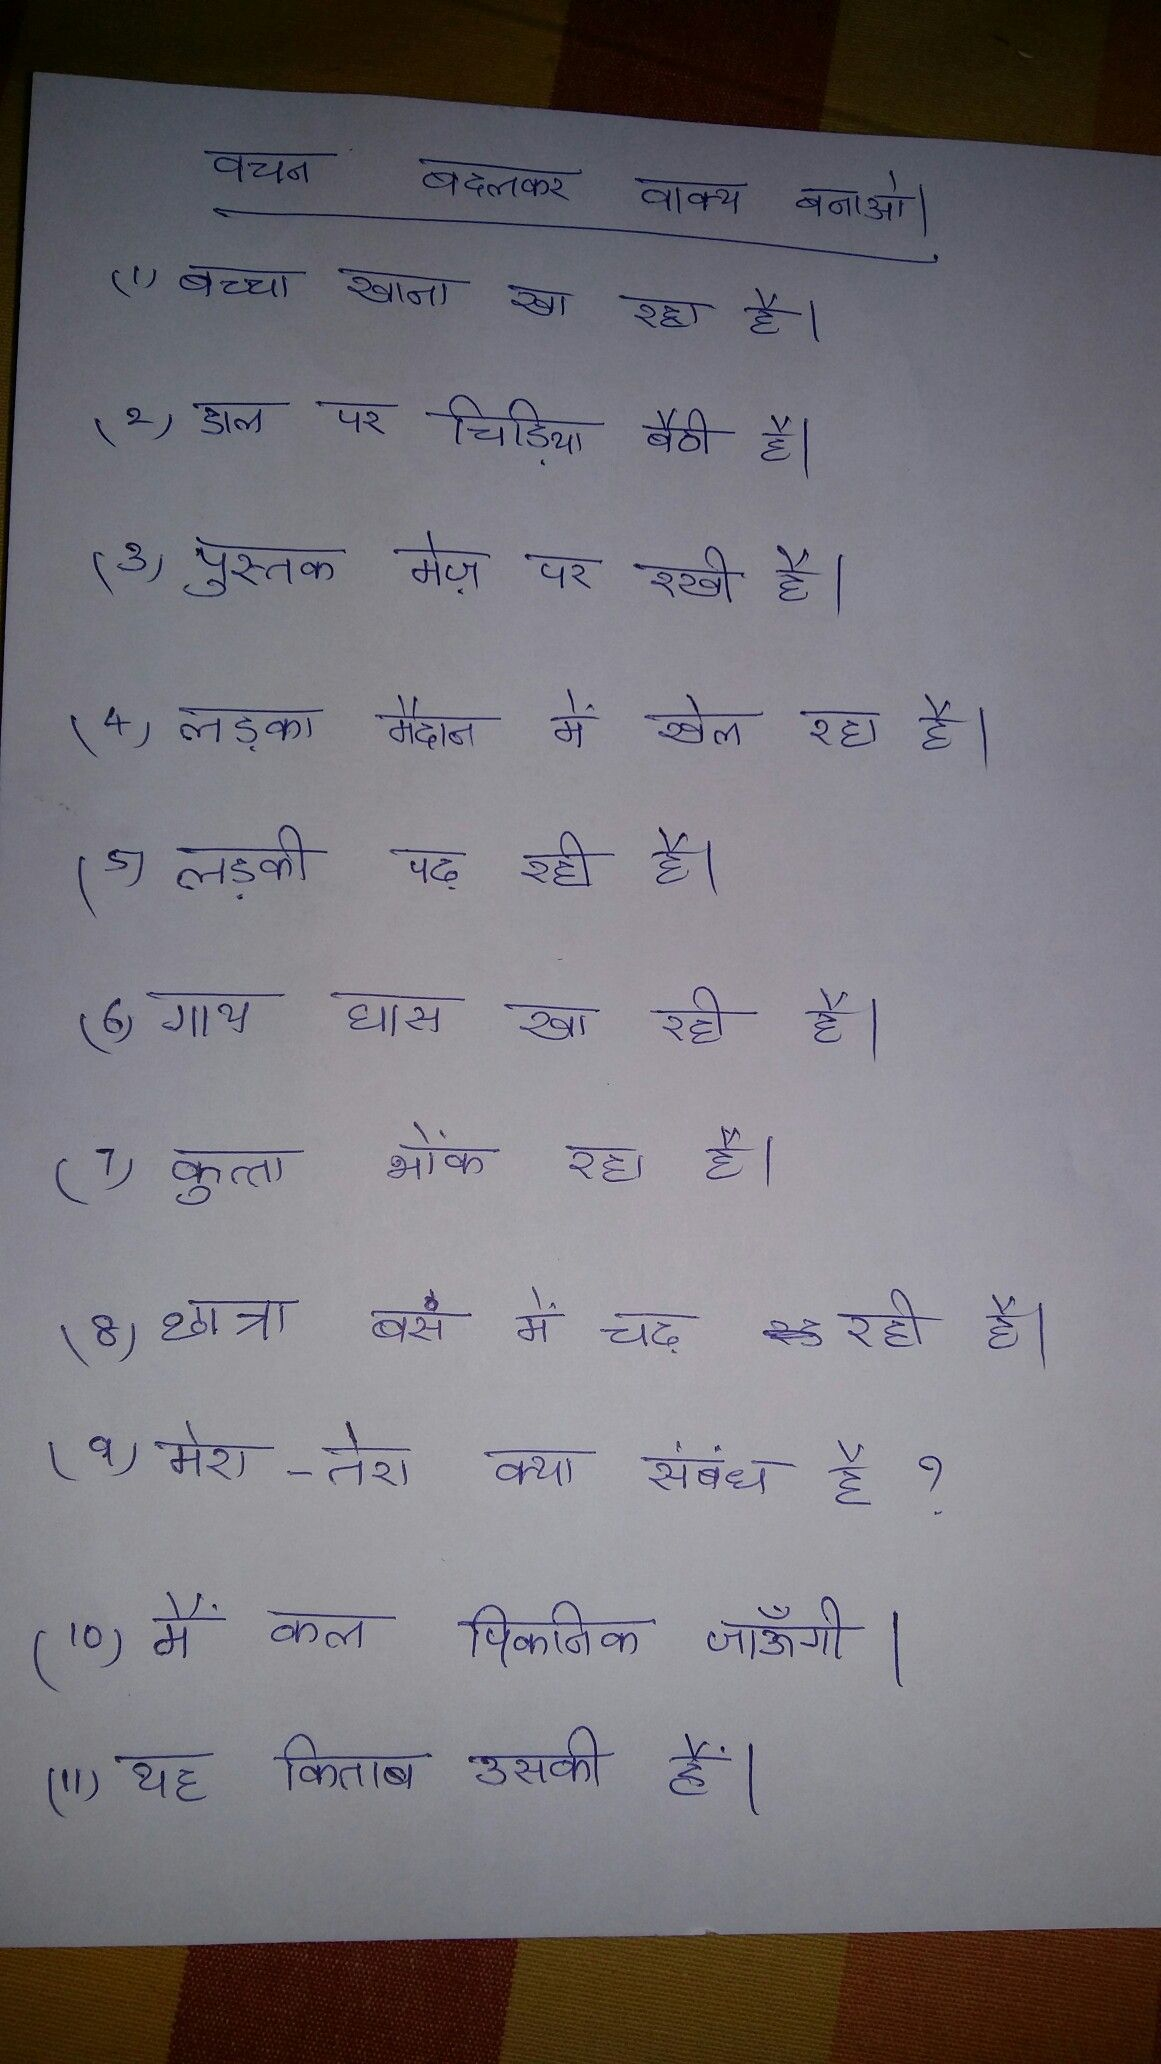 Hindi Grammar Vachan Worksheet